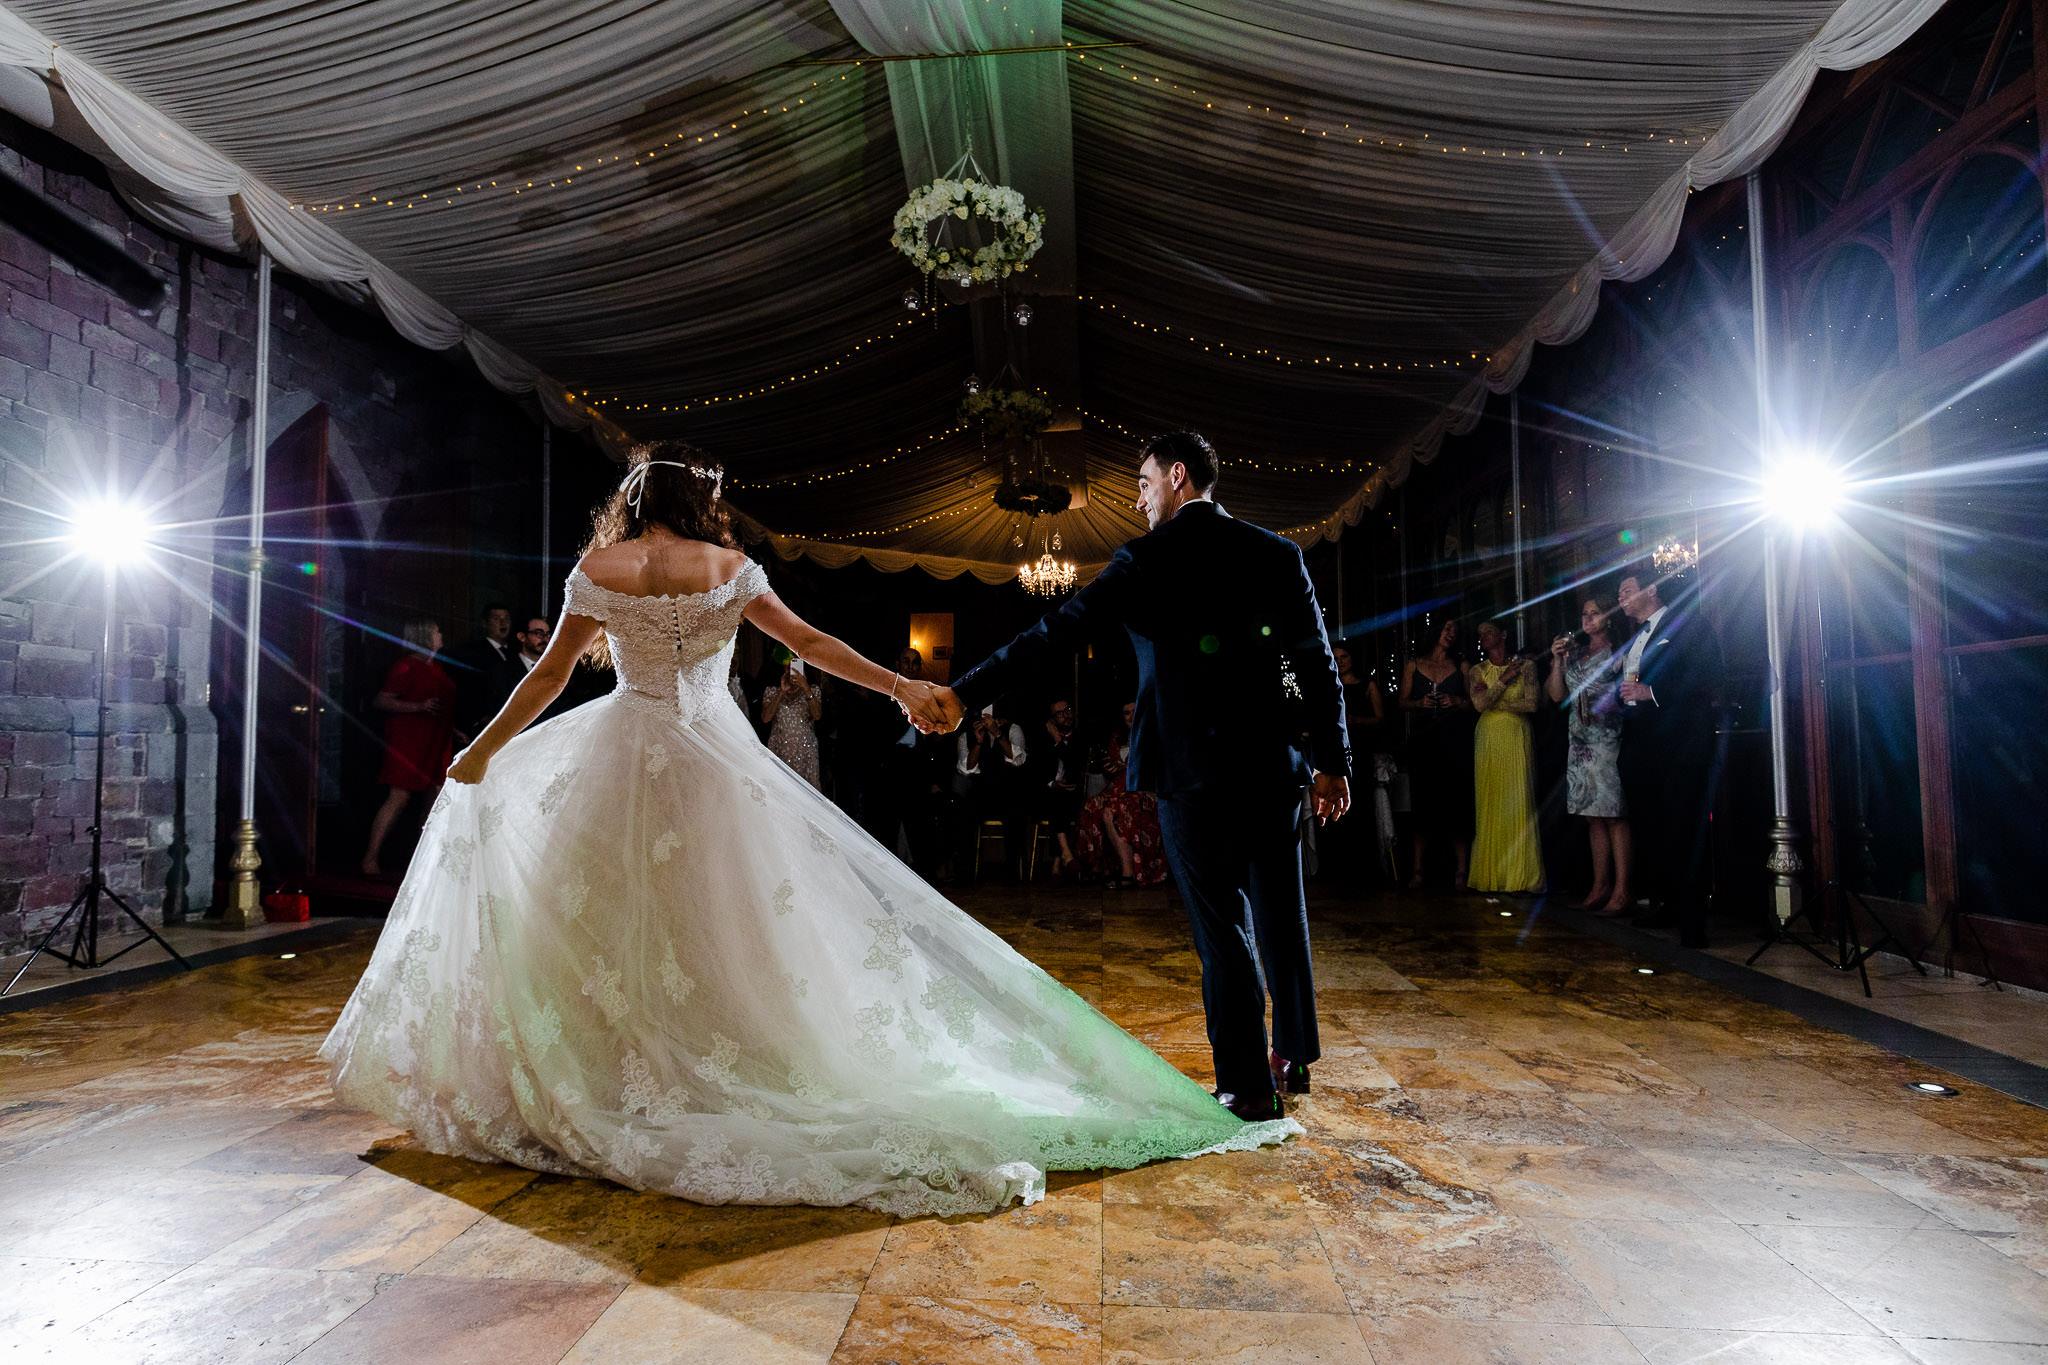 Craig y nos castle wedding photography - Bride and Groom first dance